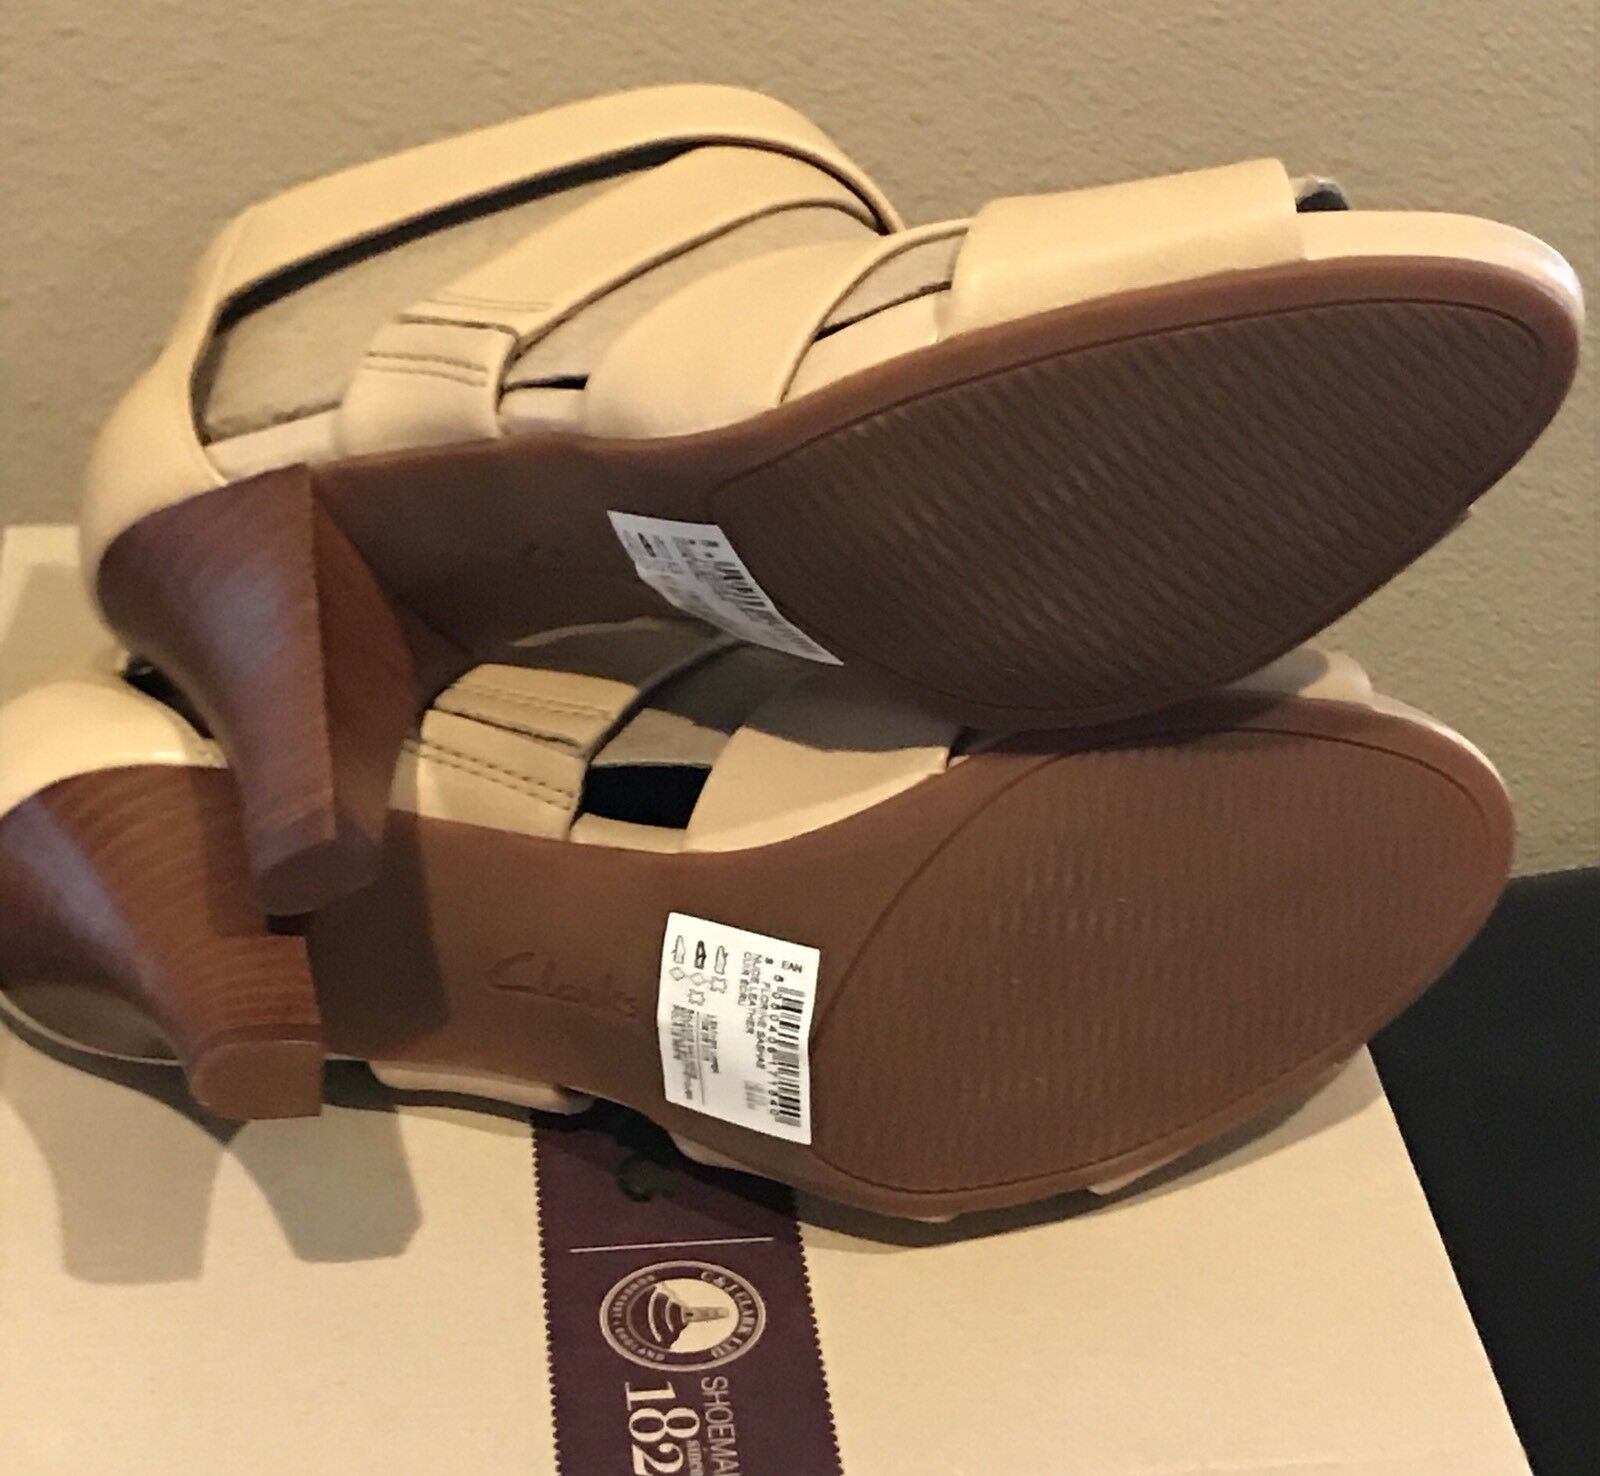 NEW Clarks Artisan Florine Sashae Leather Sandals Heels Heels Heels Sz 9.5 Nude Beige 9 1 2 53ce8f